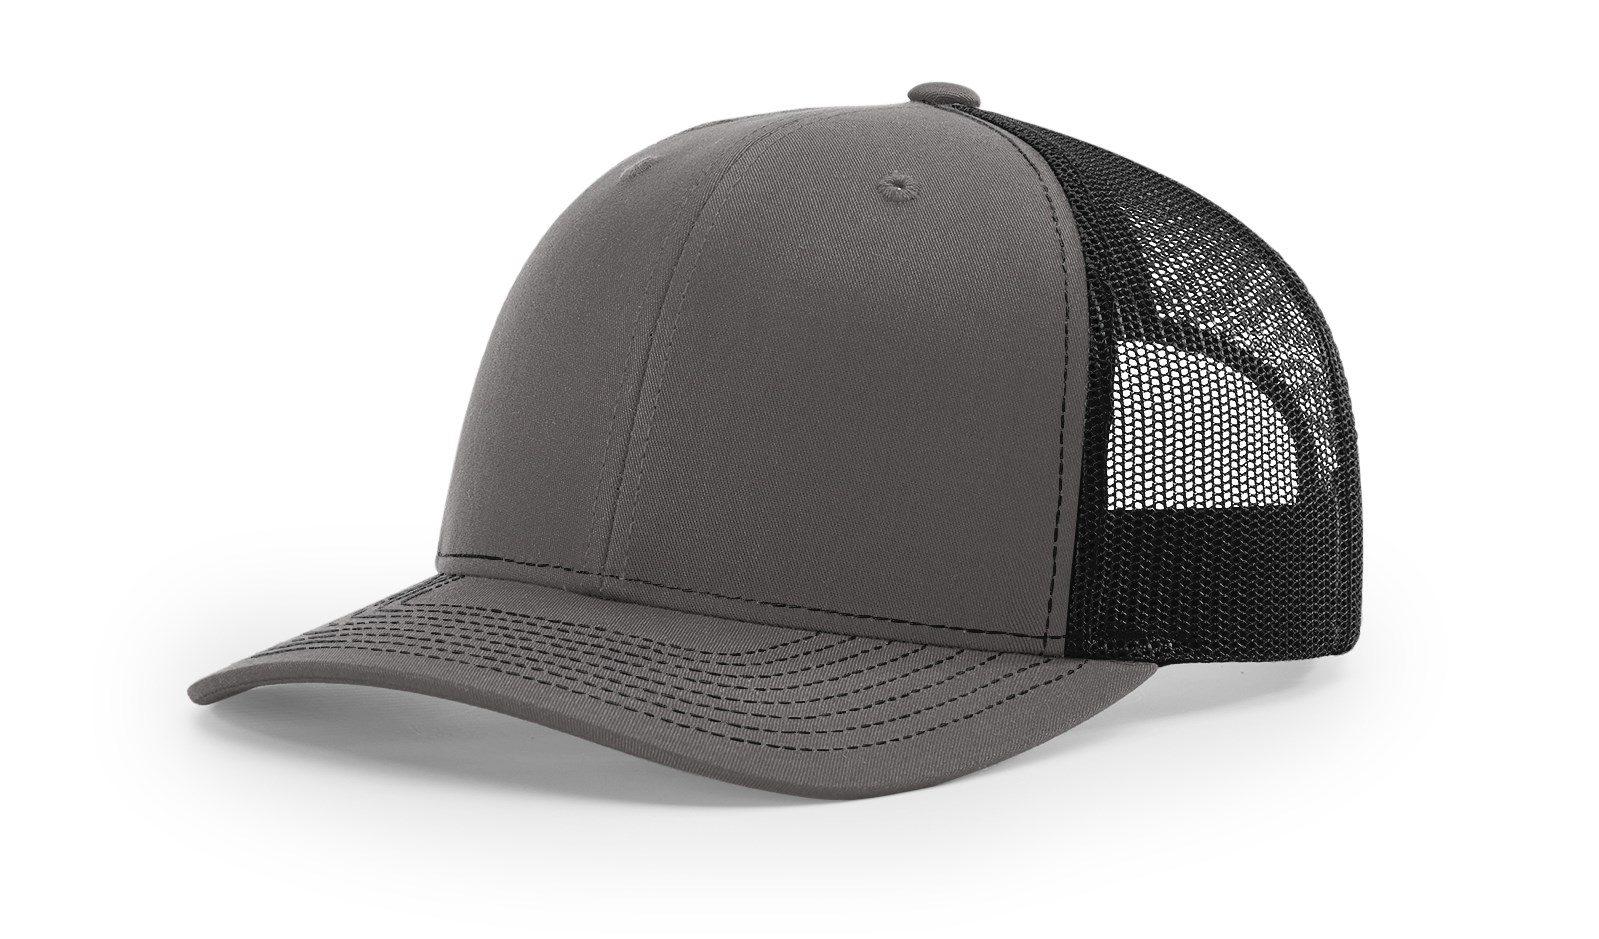 R112 Charcoal Black